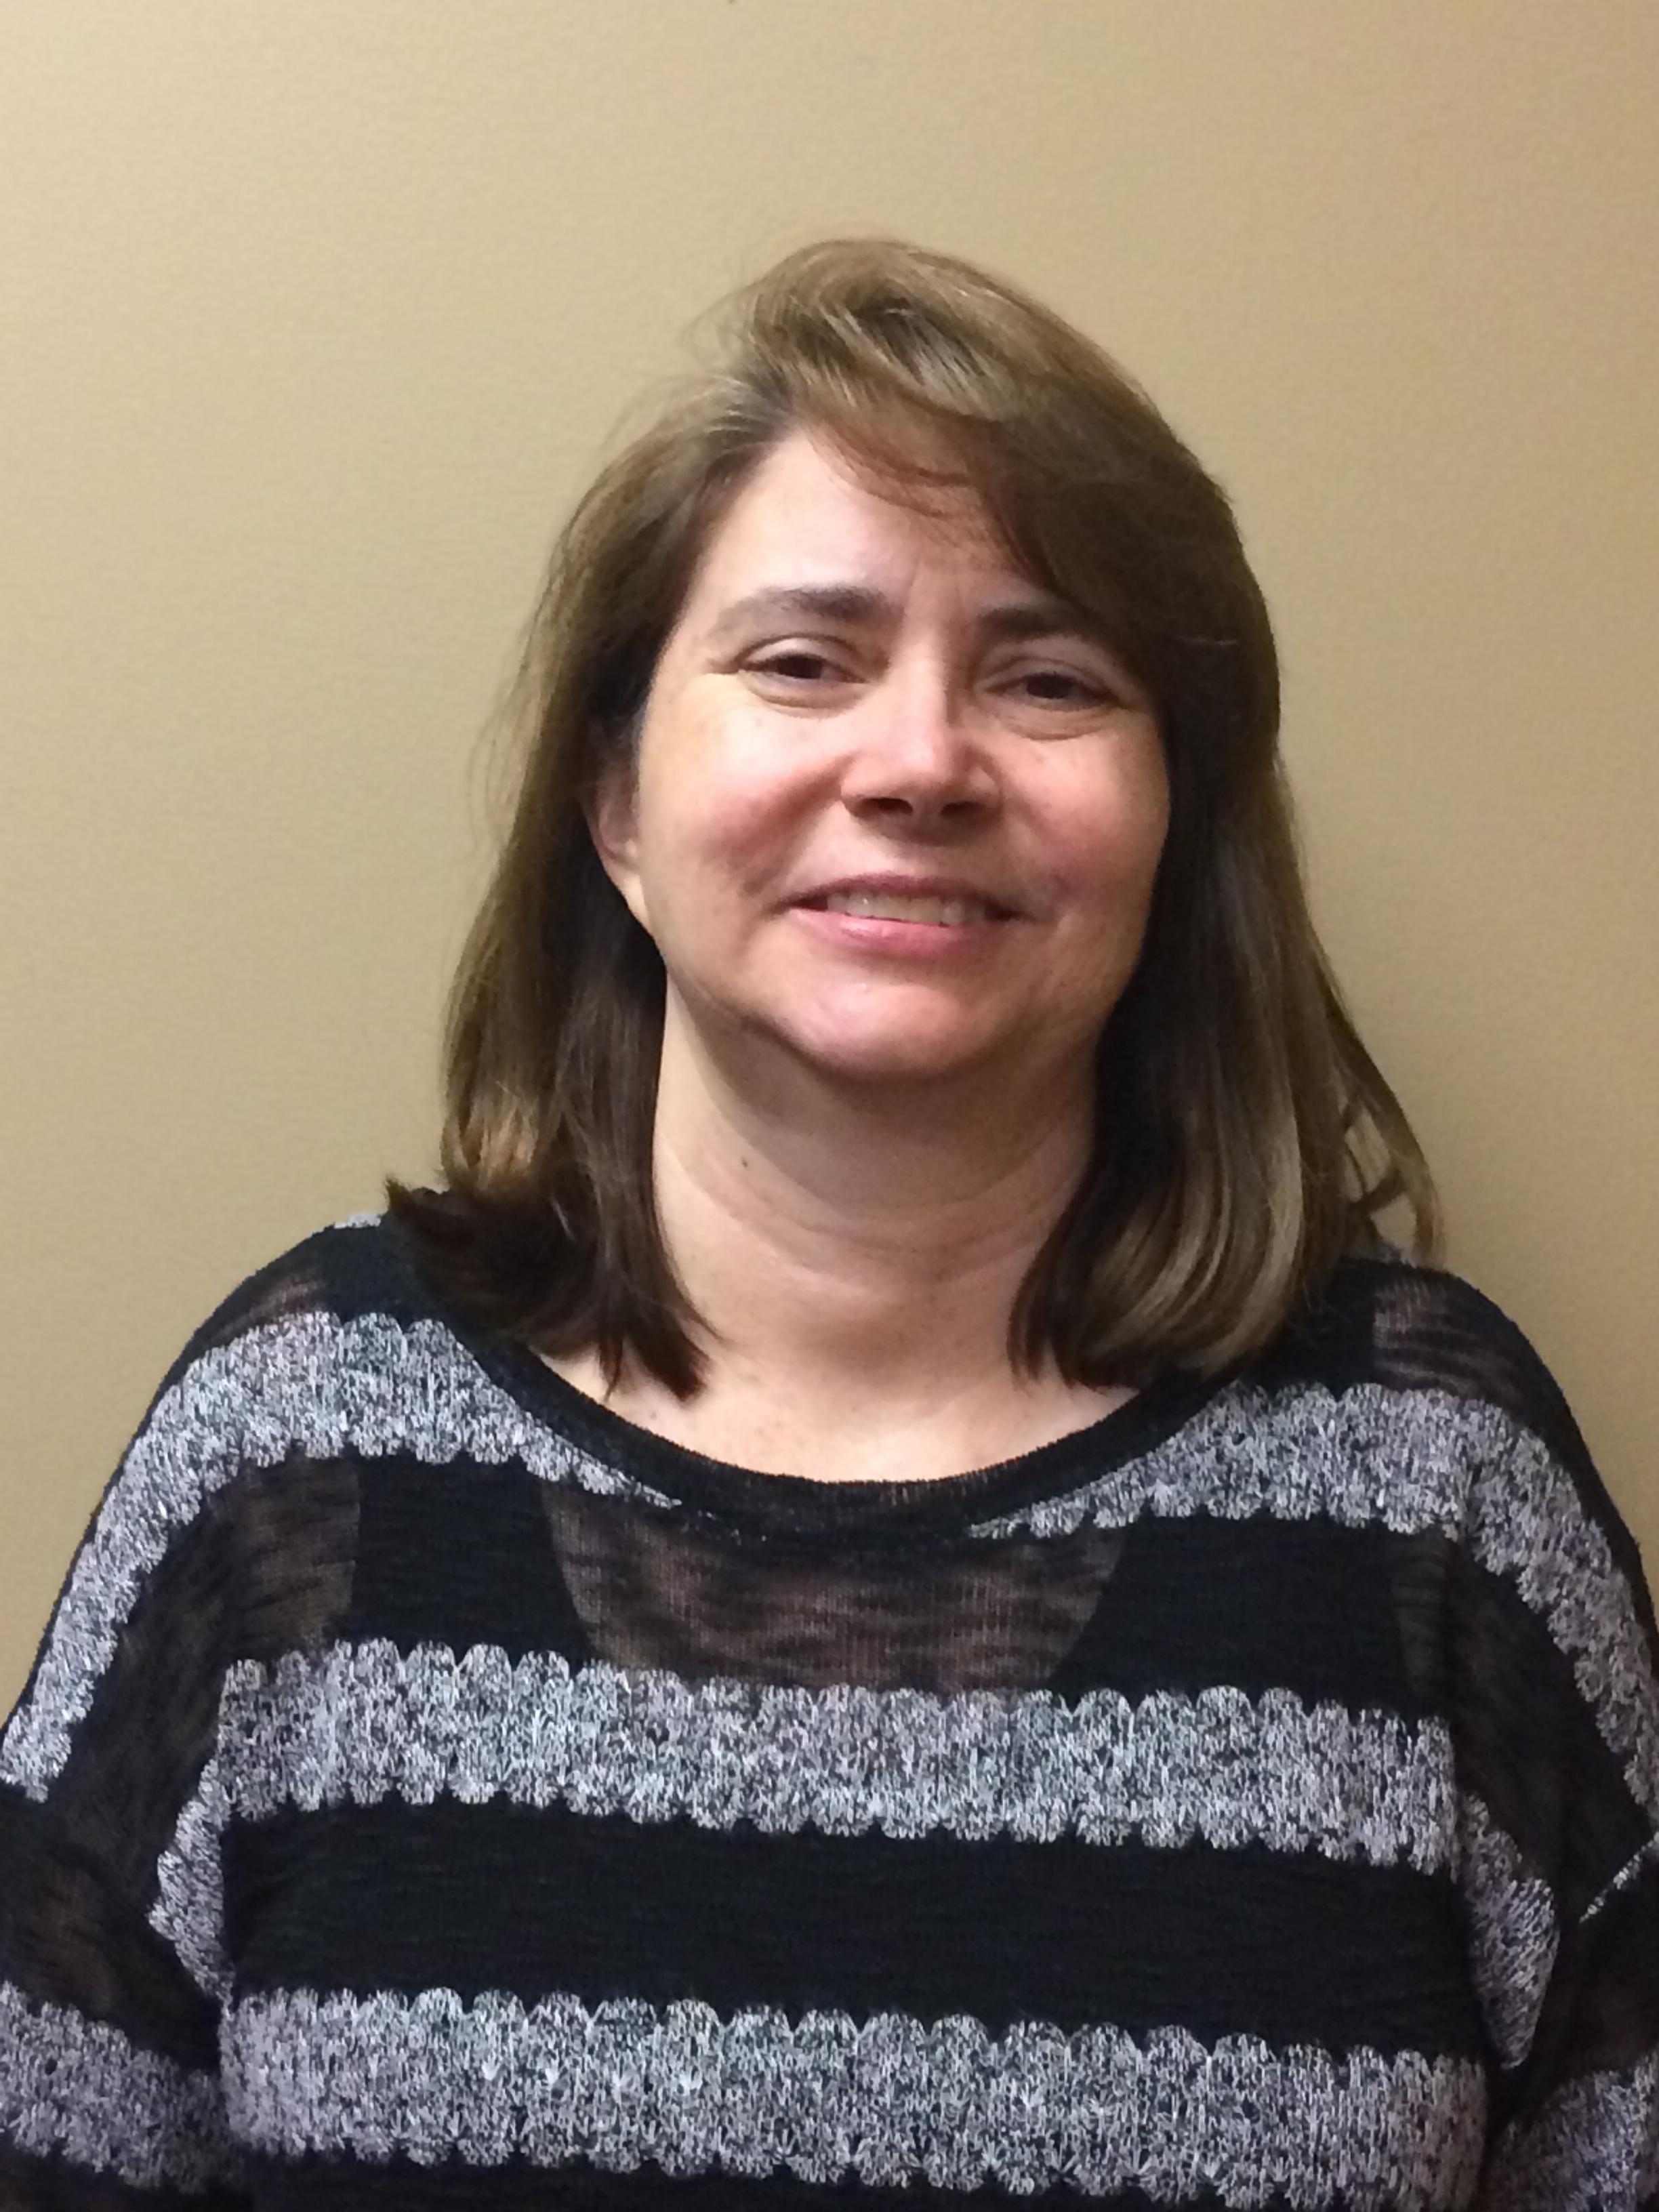 Sherri Harbin of Metro Heating and Cooling, Inc.